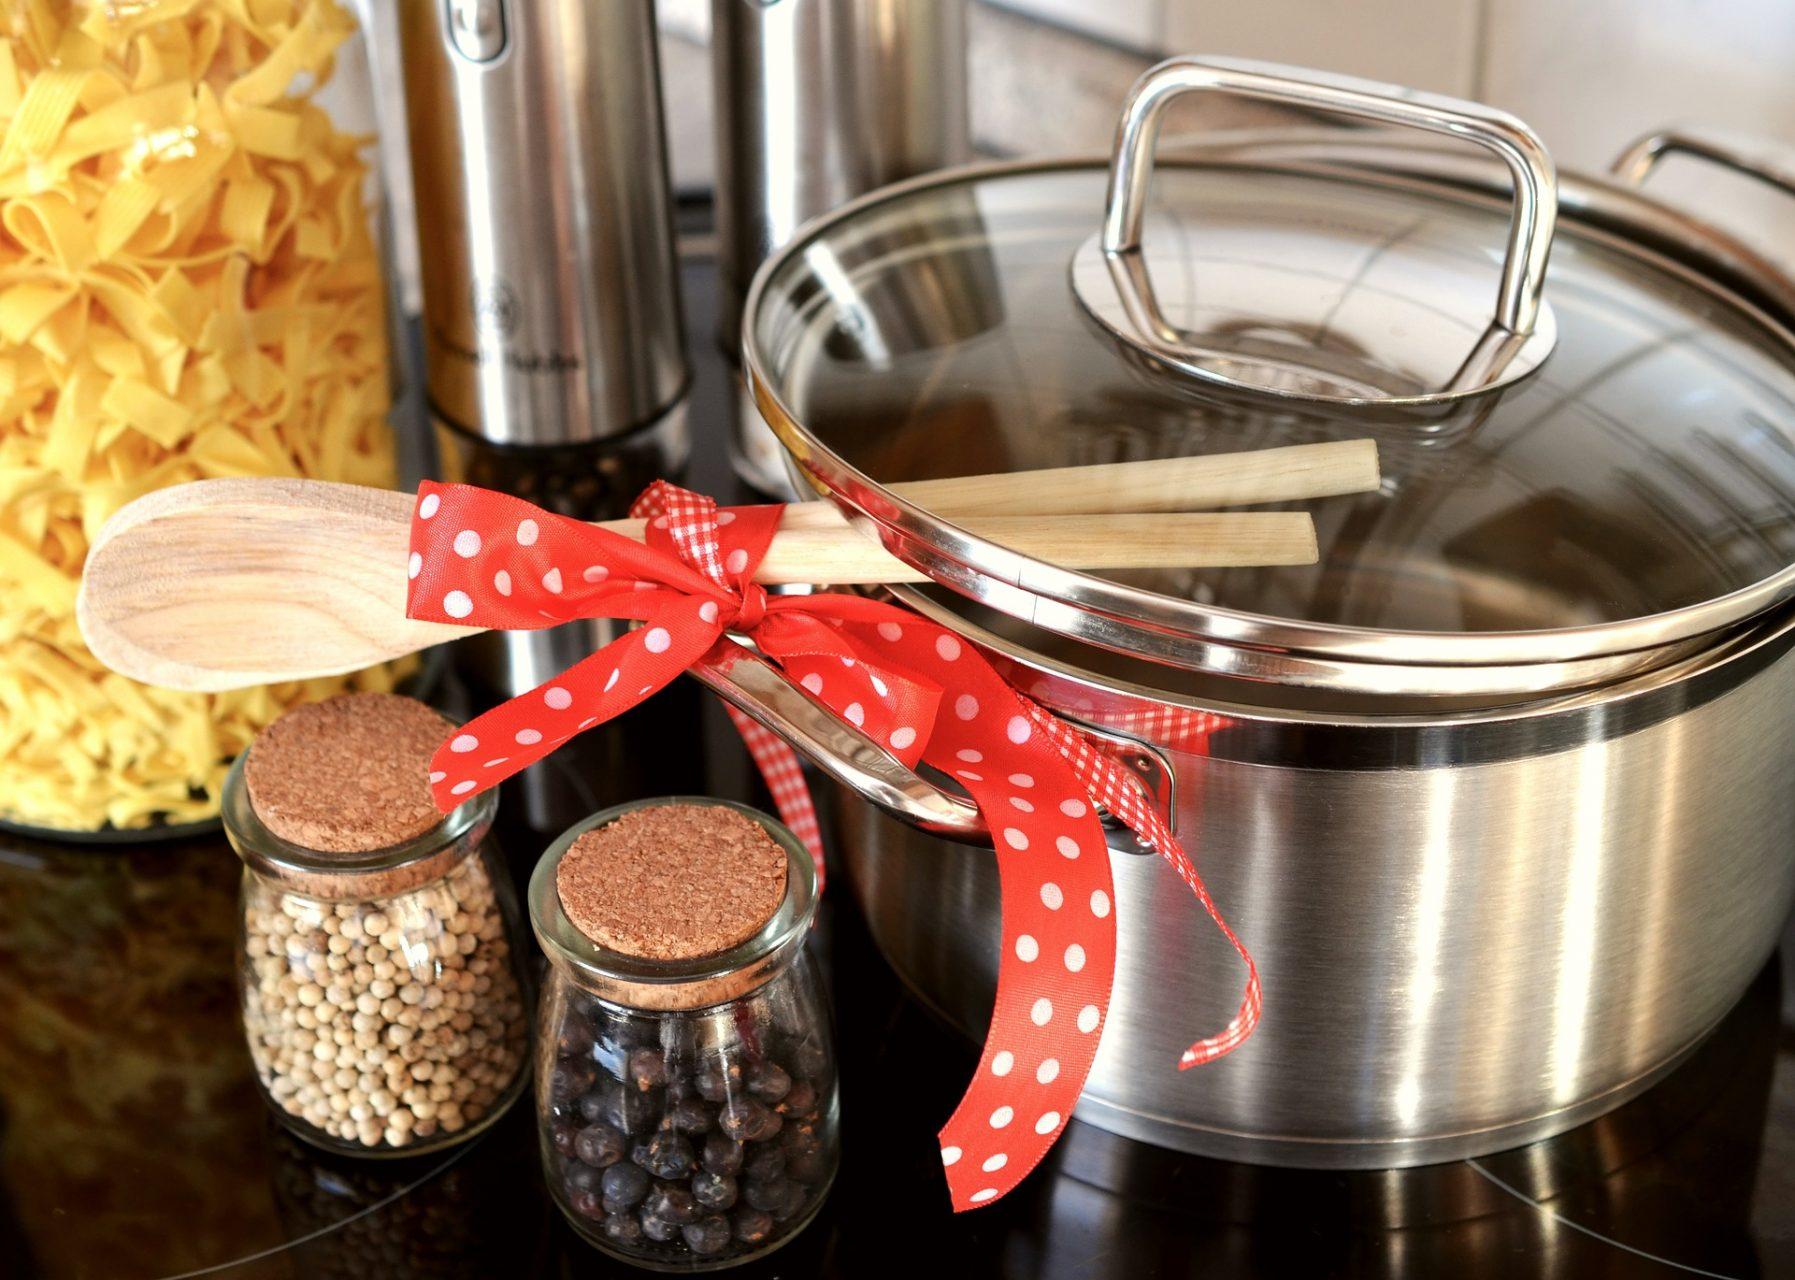 Kako očistiti aluminijske lonce Kako očistiti kuhunjske lonce